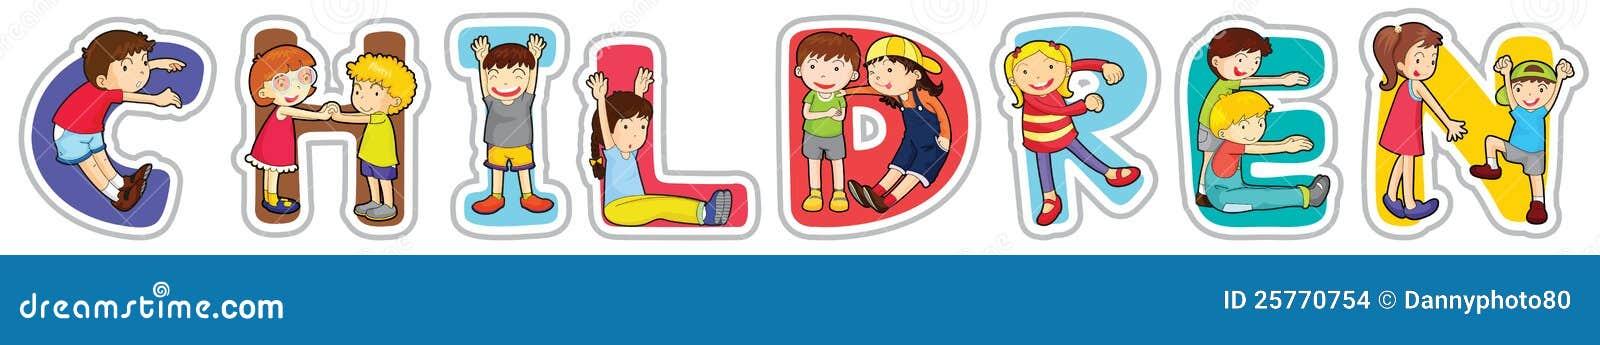 English word children stock illustration. Illustration of ...